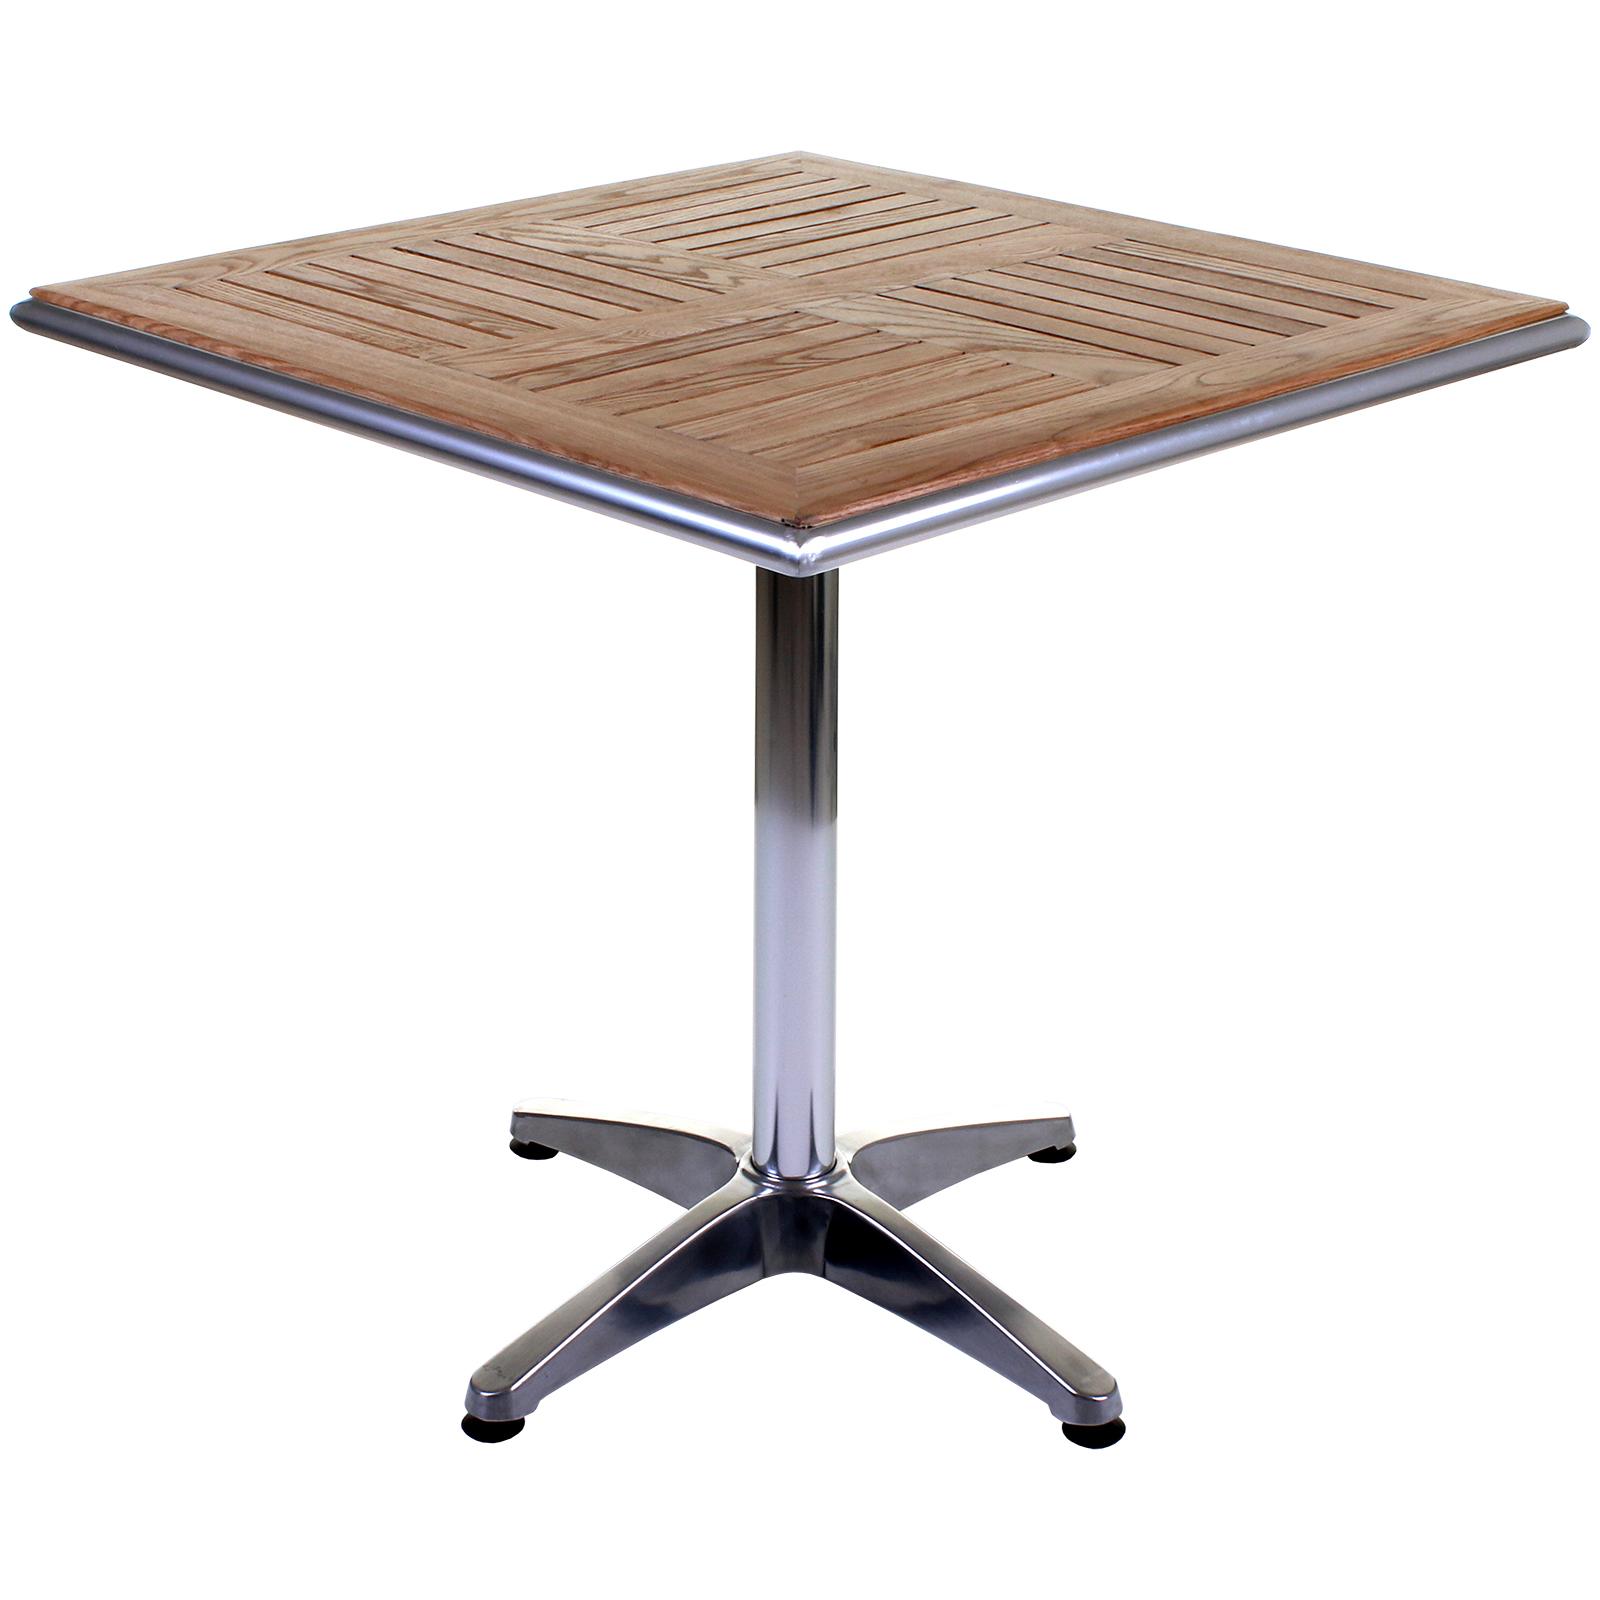 Chrome Bistro Sets Aluminium Outdoor Garden Cafe Furniture Ash Wood Square Table